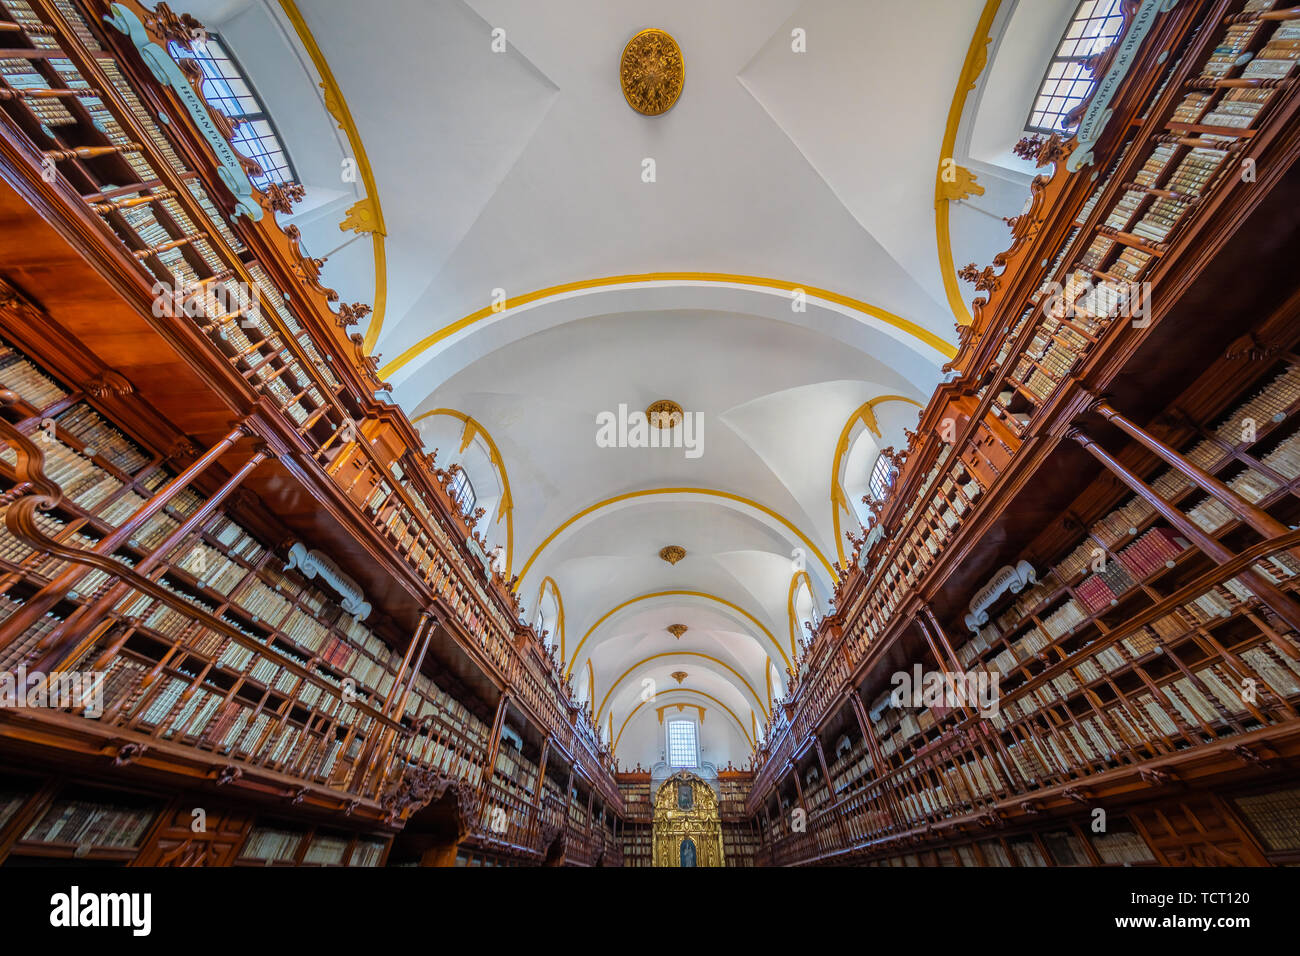 The Biblioteca Palafoxiana is a library in Puebla, Mexico. - Stock Image